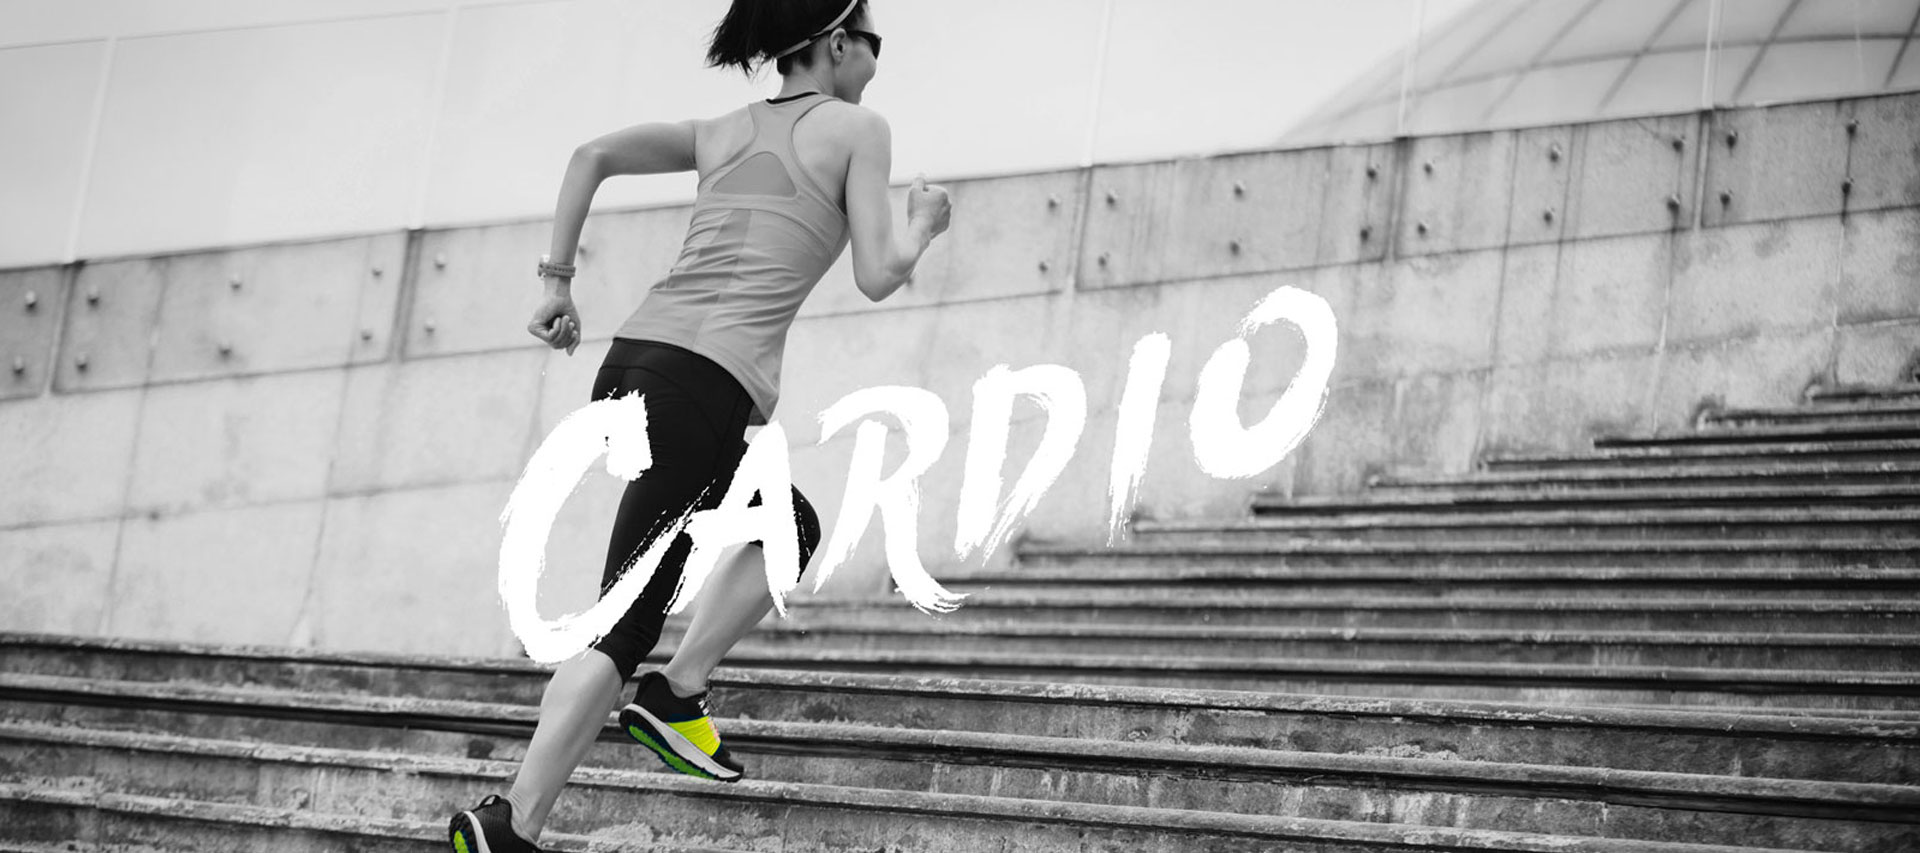 cardio classes kilkenny active club and gym